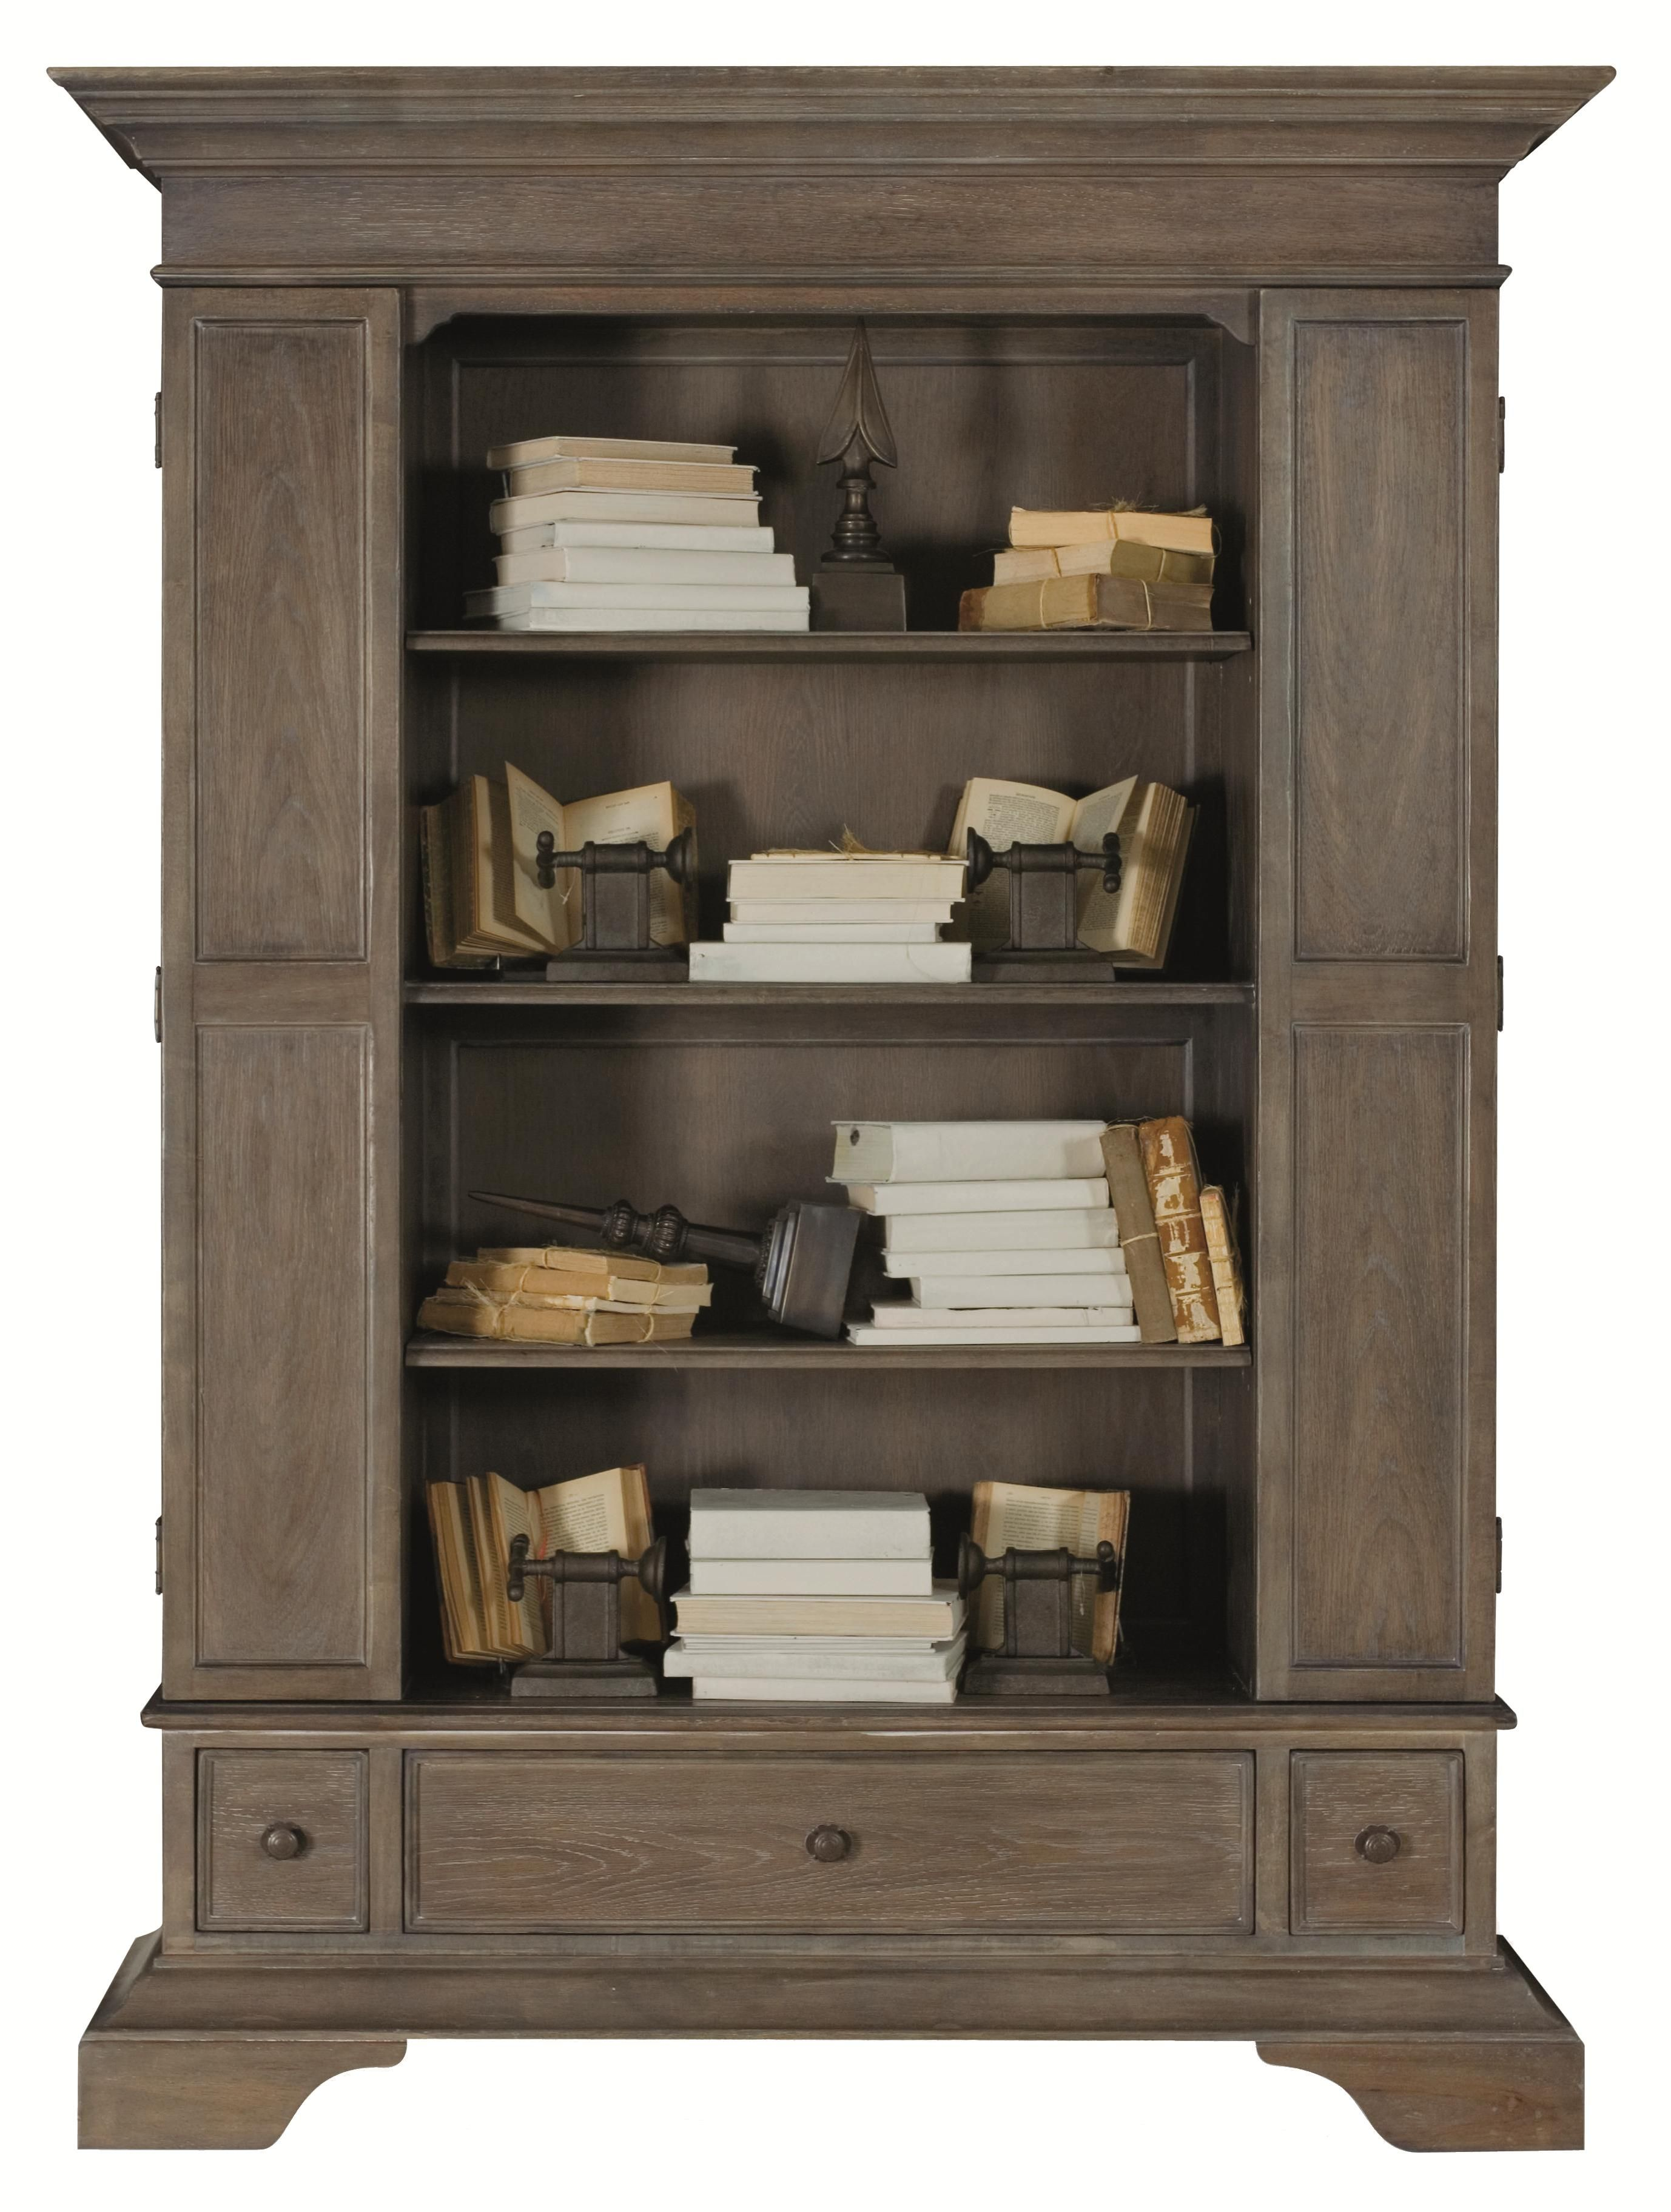 Belgian Oak Bookcase by Bernhardt, living room idea Мебель